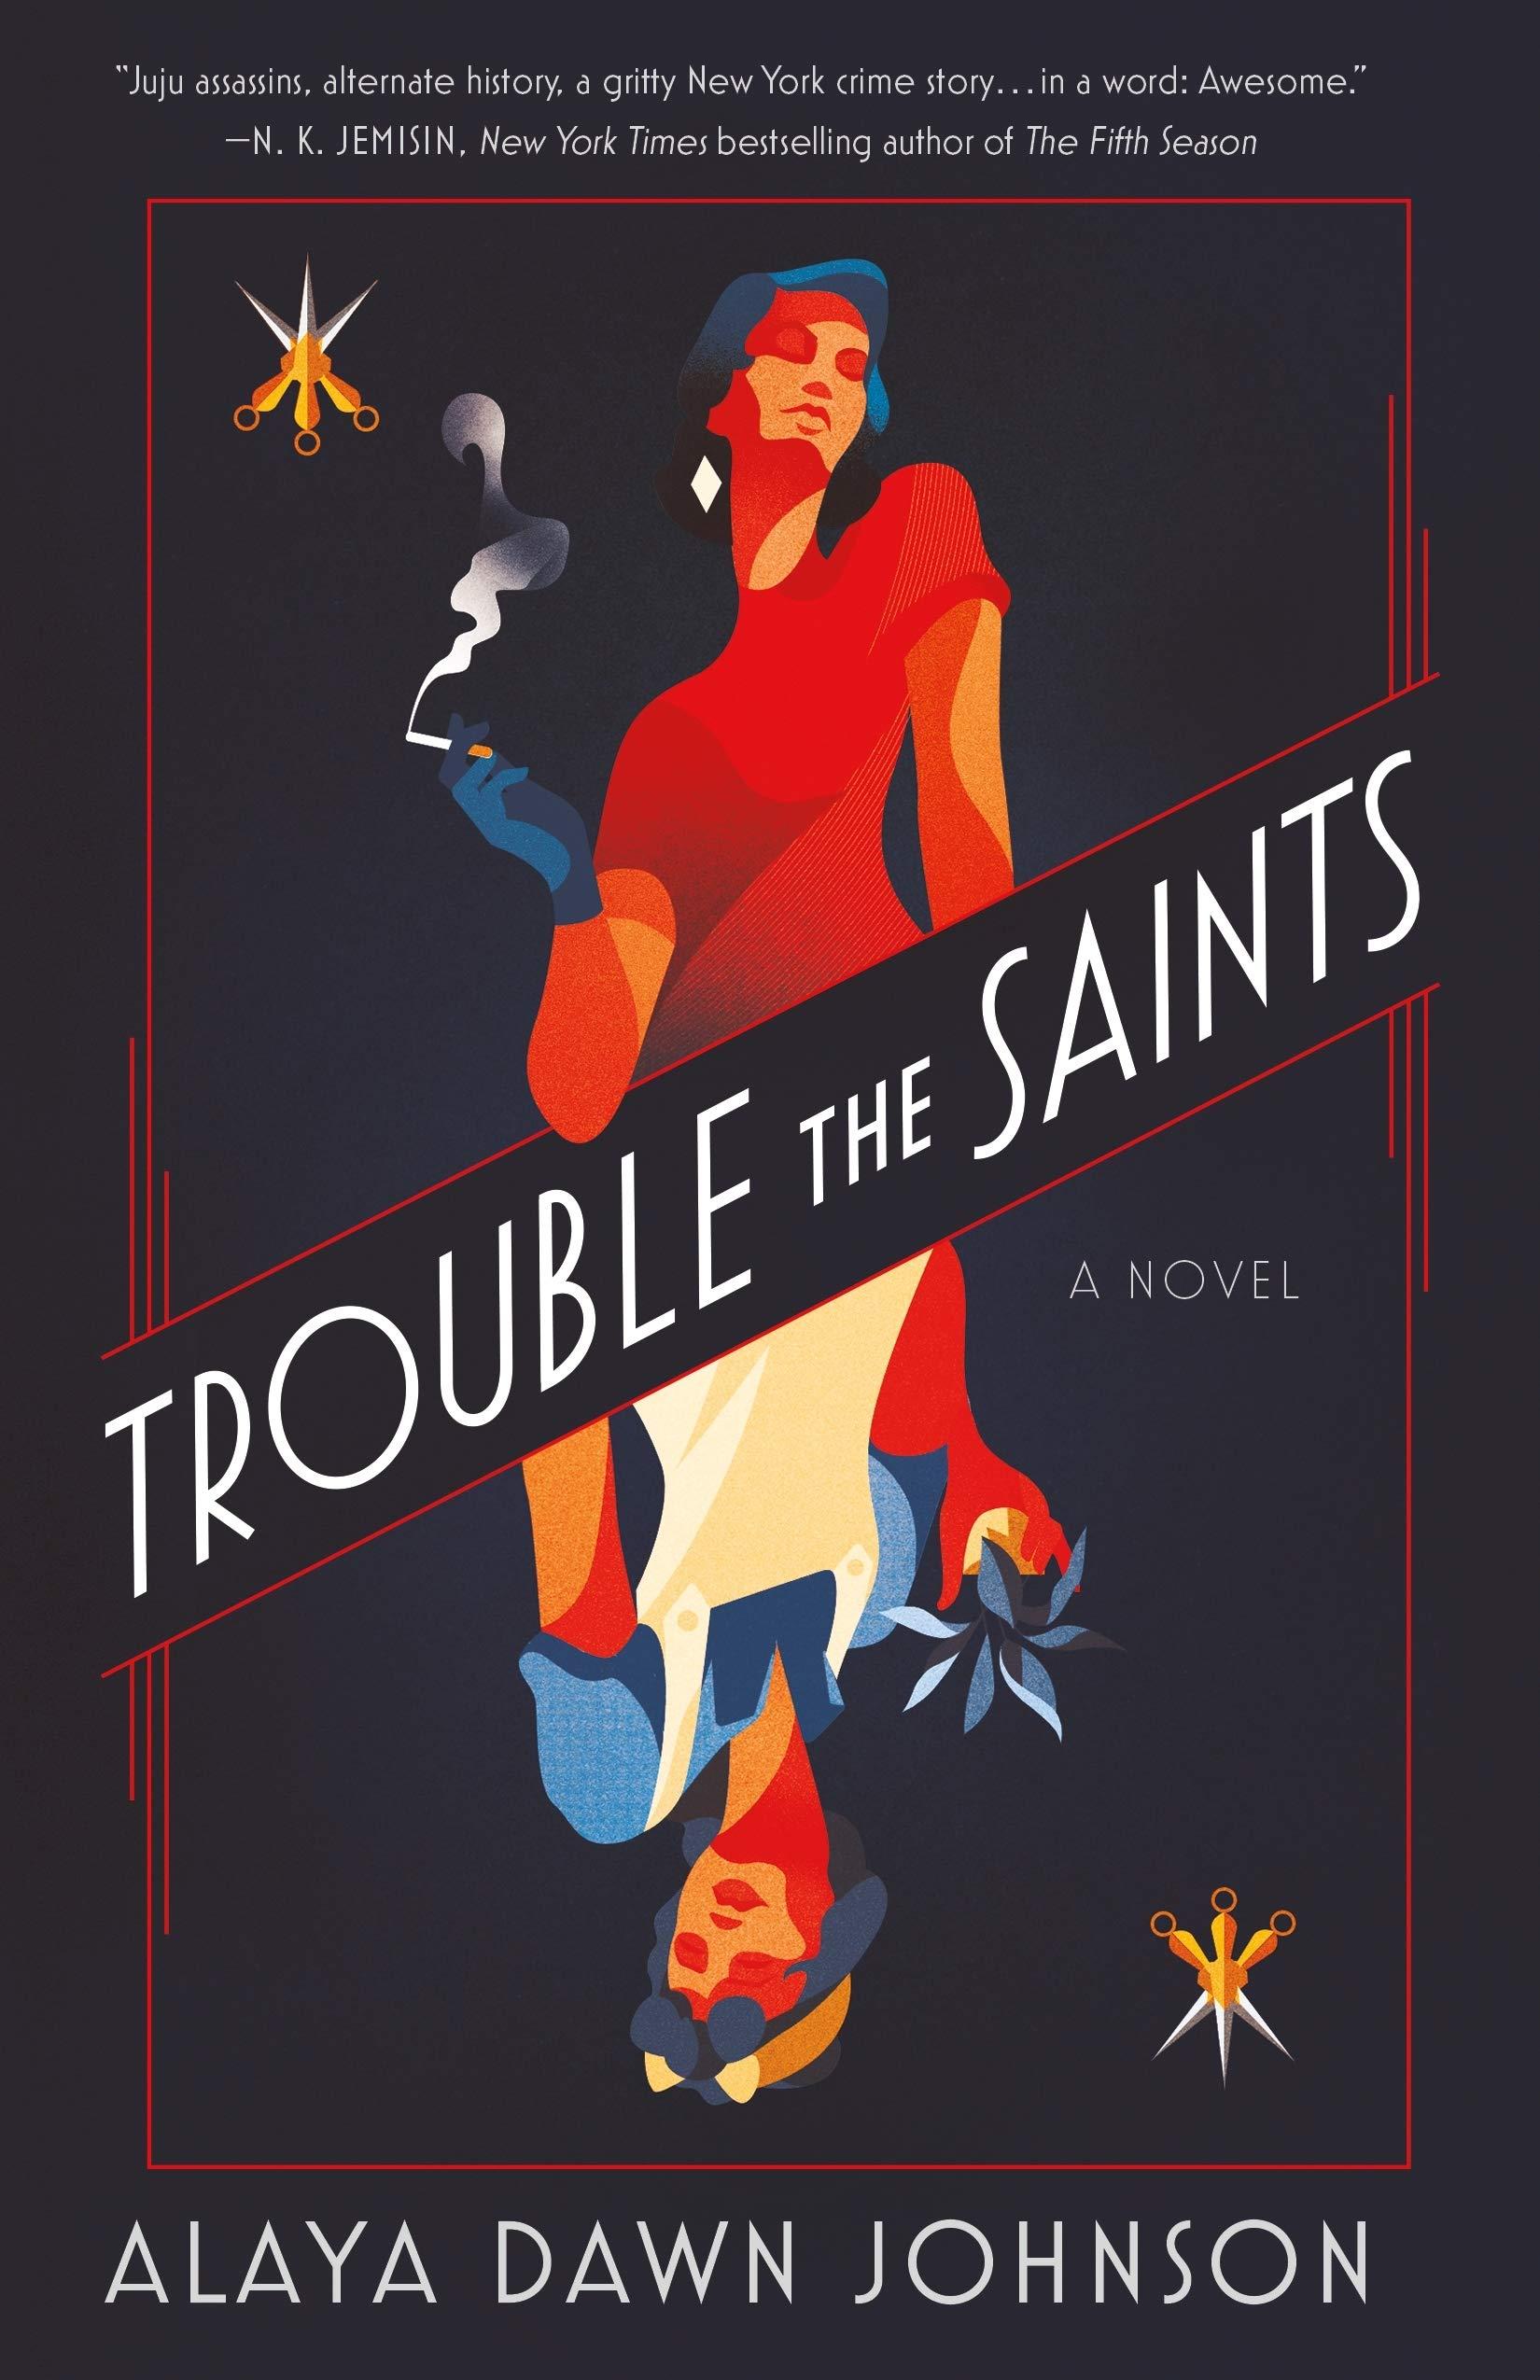 Amazon.com: Trouble the Saints: A Novel (9781250175342): Johnson ...